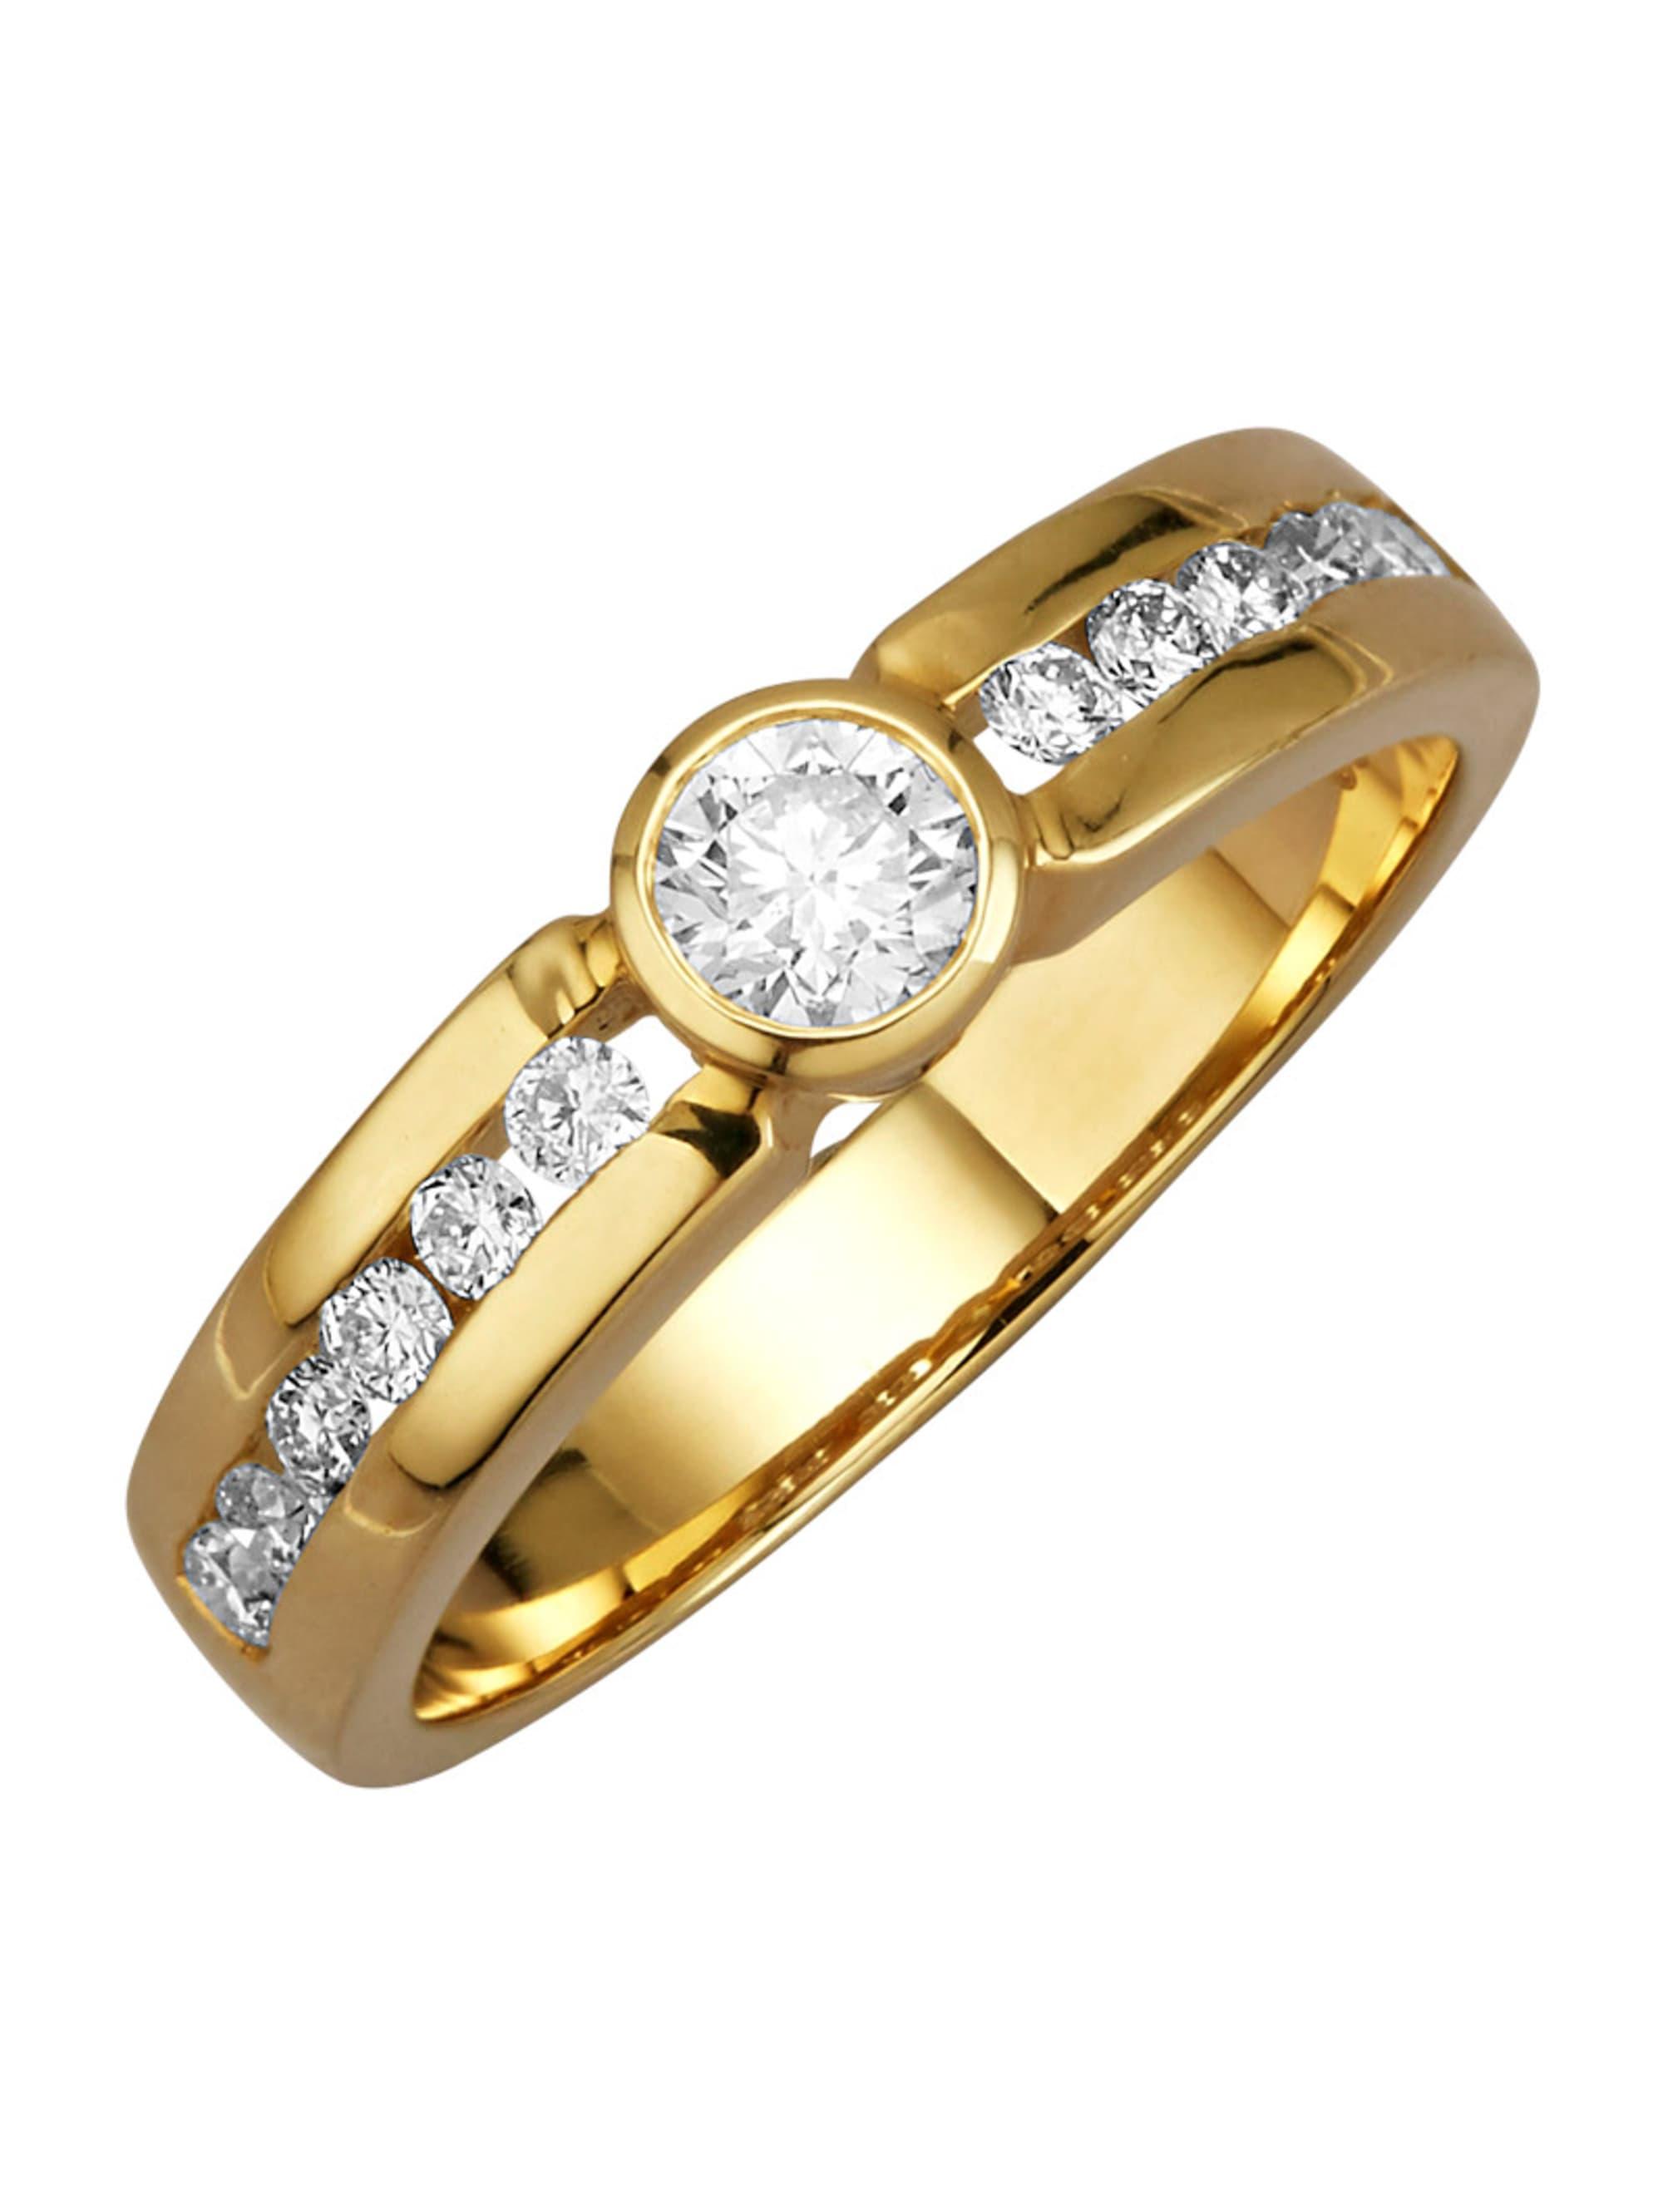 Diemer Diamant Damenring mit Brillanten iReFa